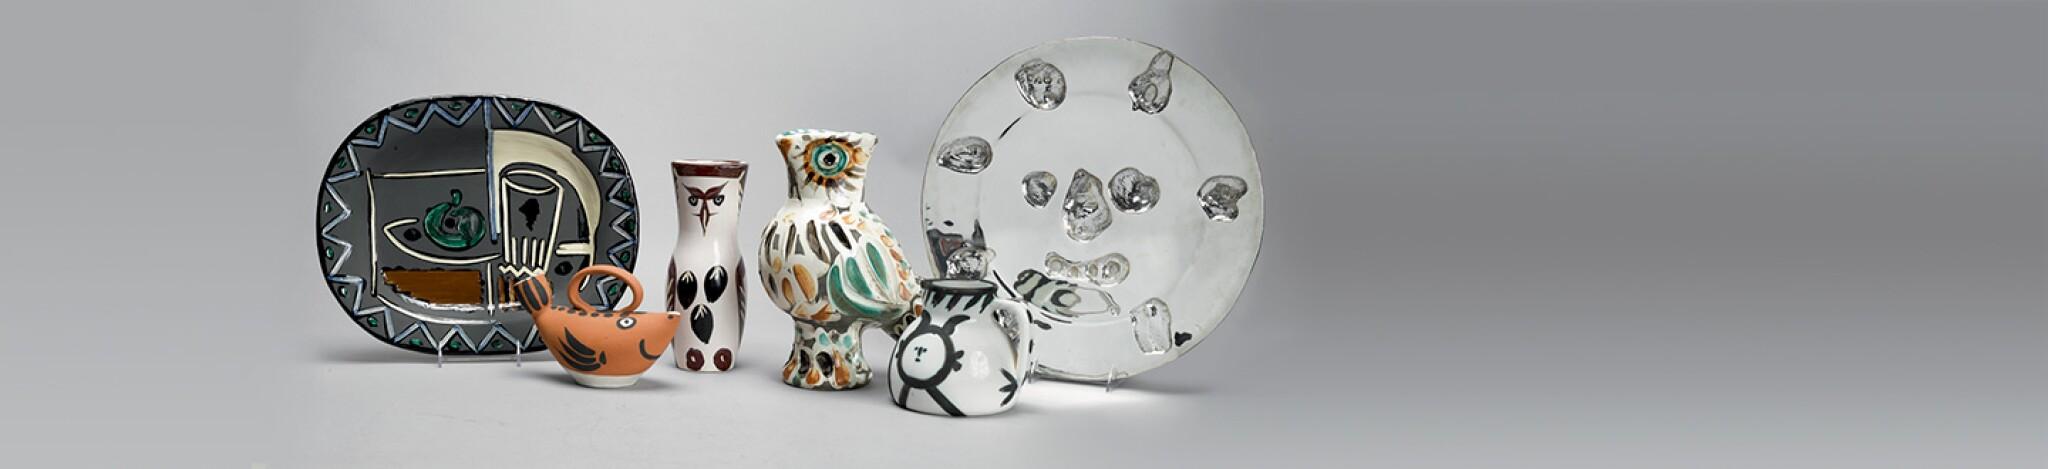 Picasso Prints and Ceramics Online